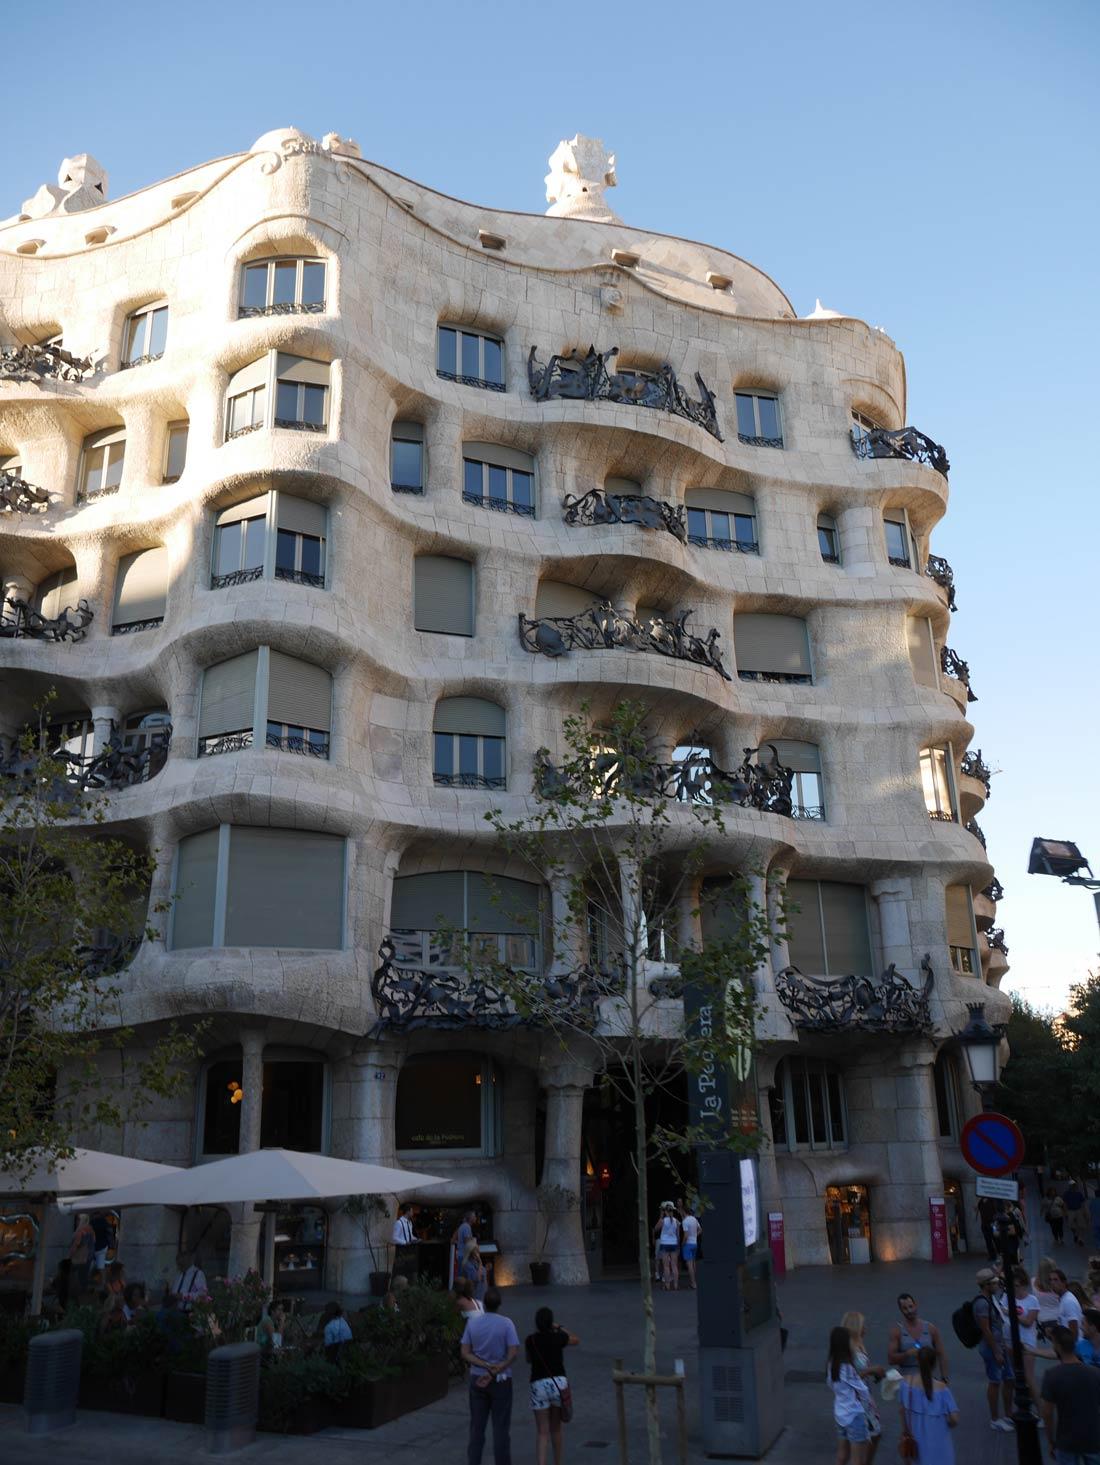 bonnes adresses à Barcelone : La Pedrera